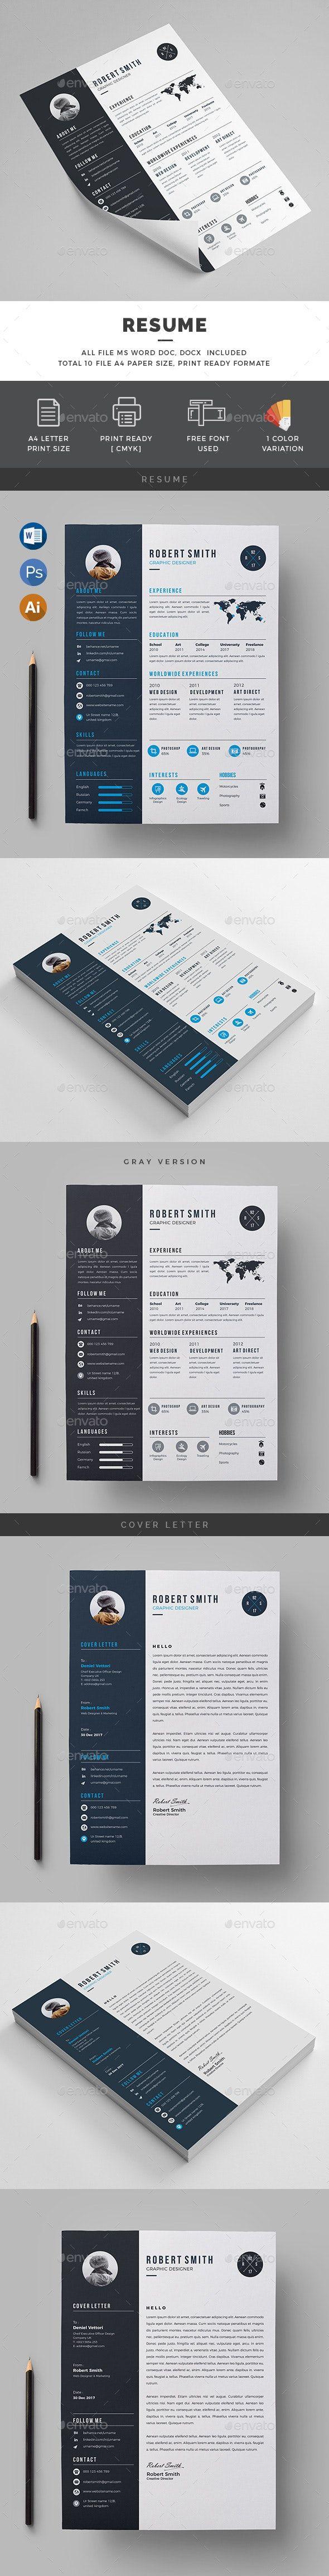 Resume AD Resume Simple resume template, Resume